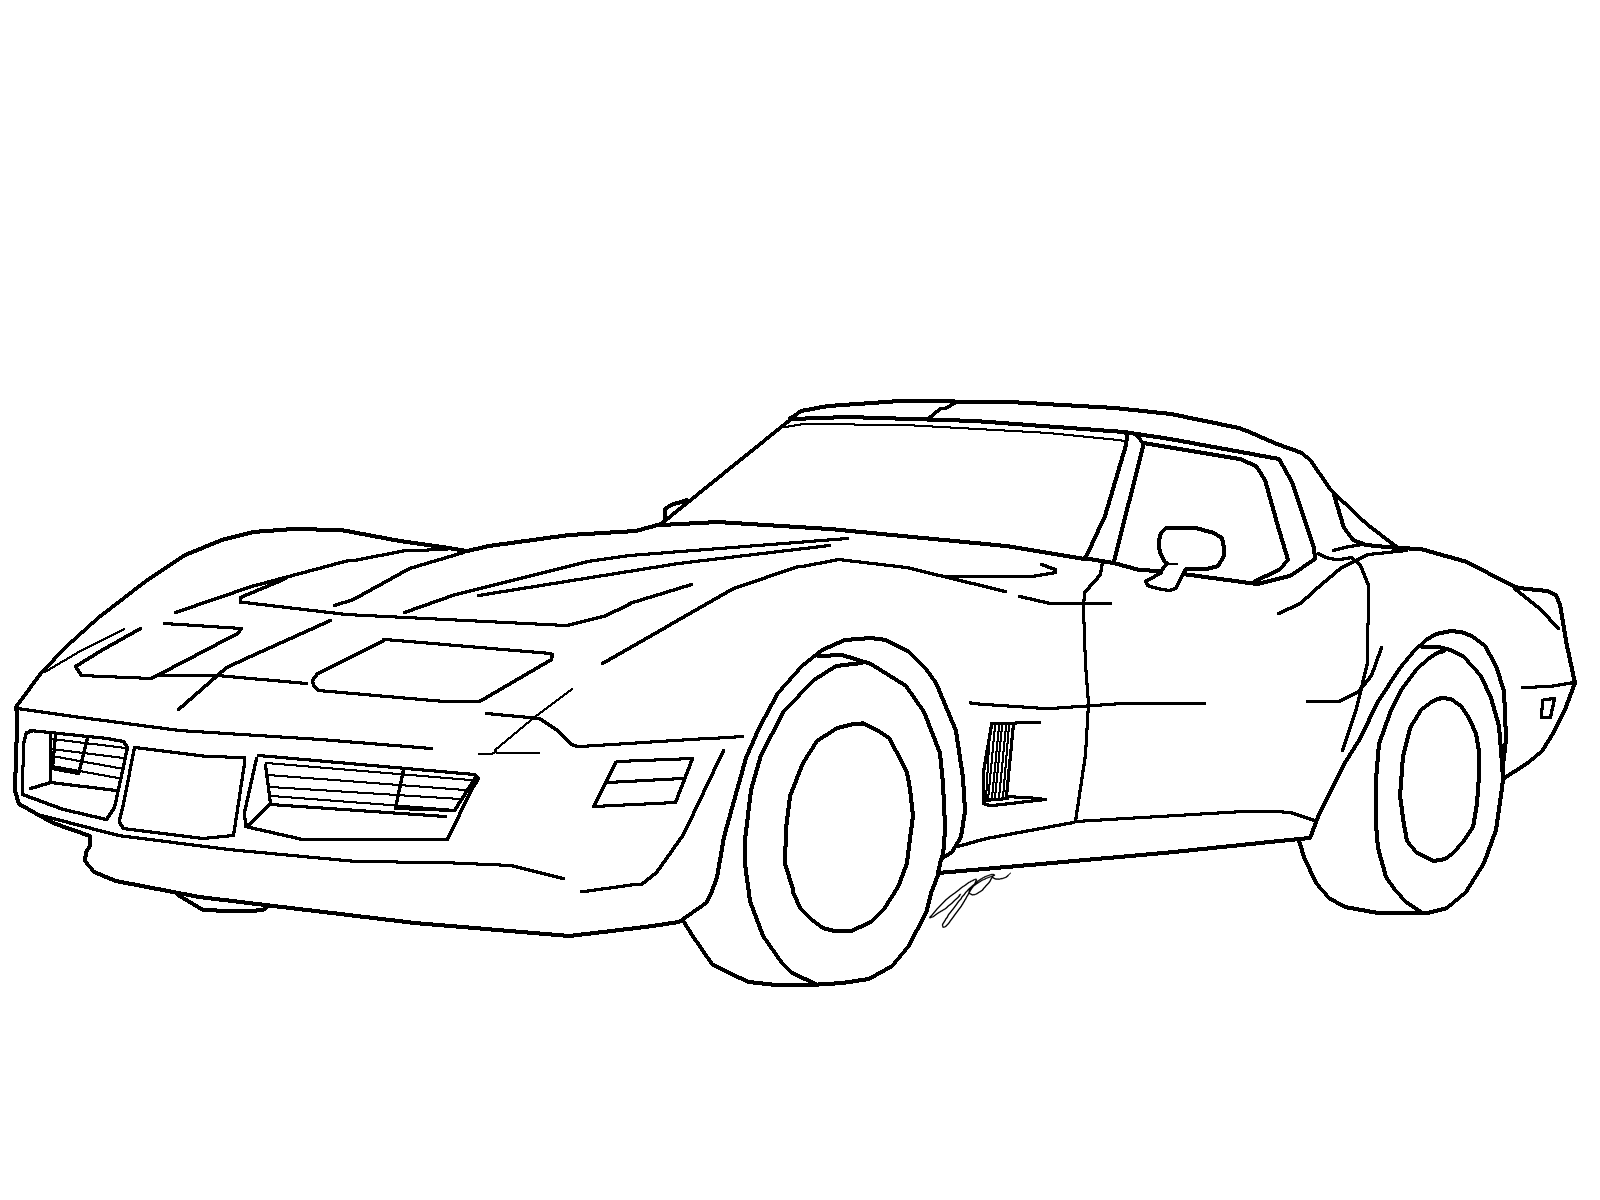 Chevrolet Corvette Drawing At Getdrawings